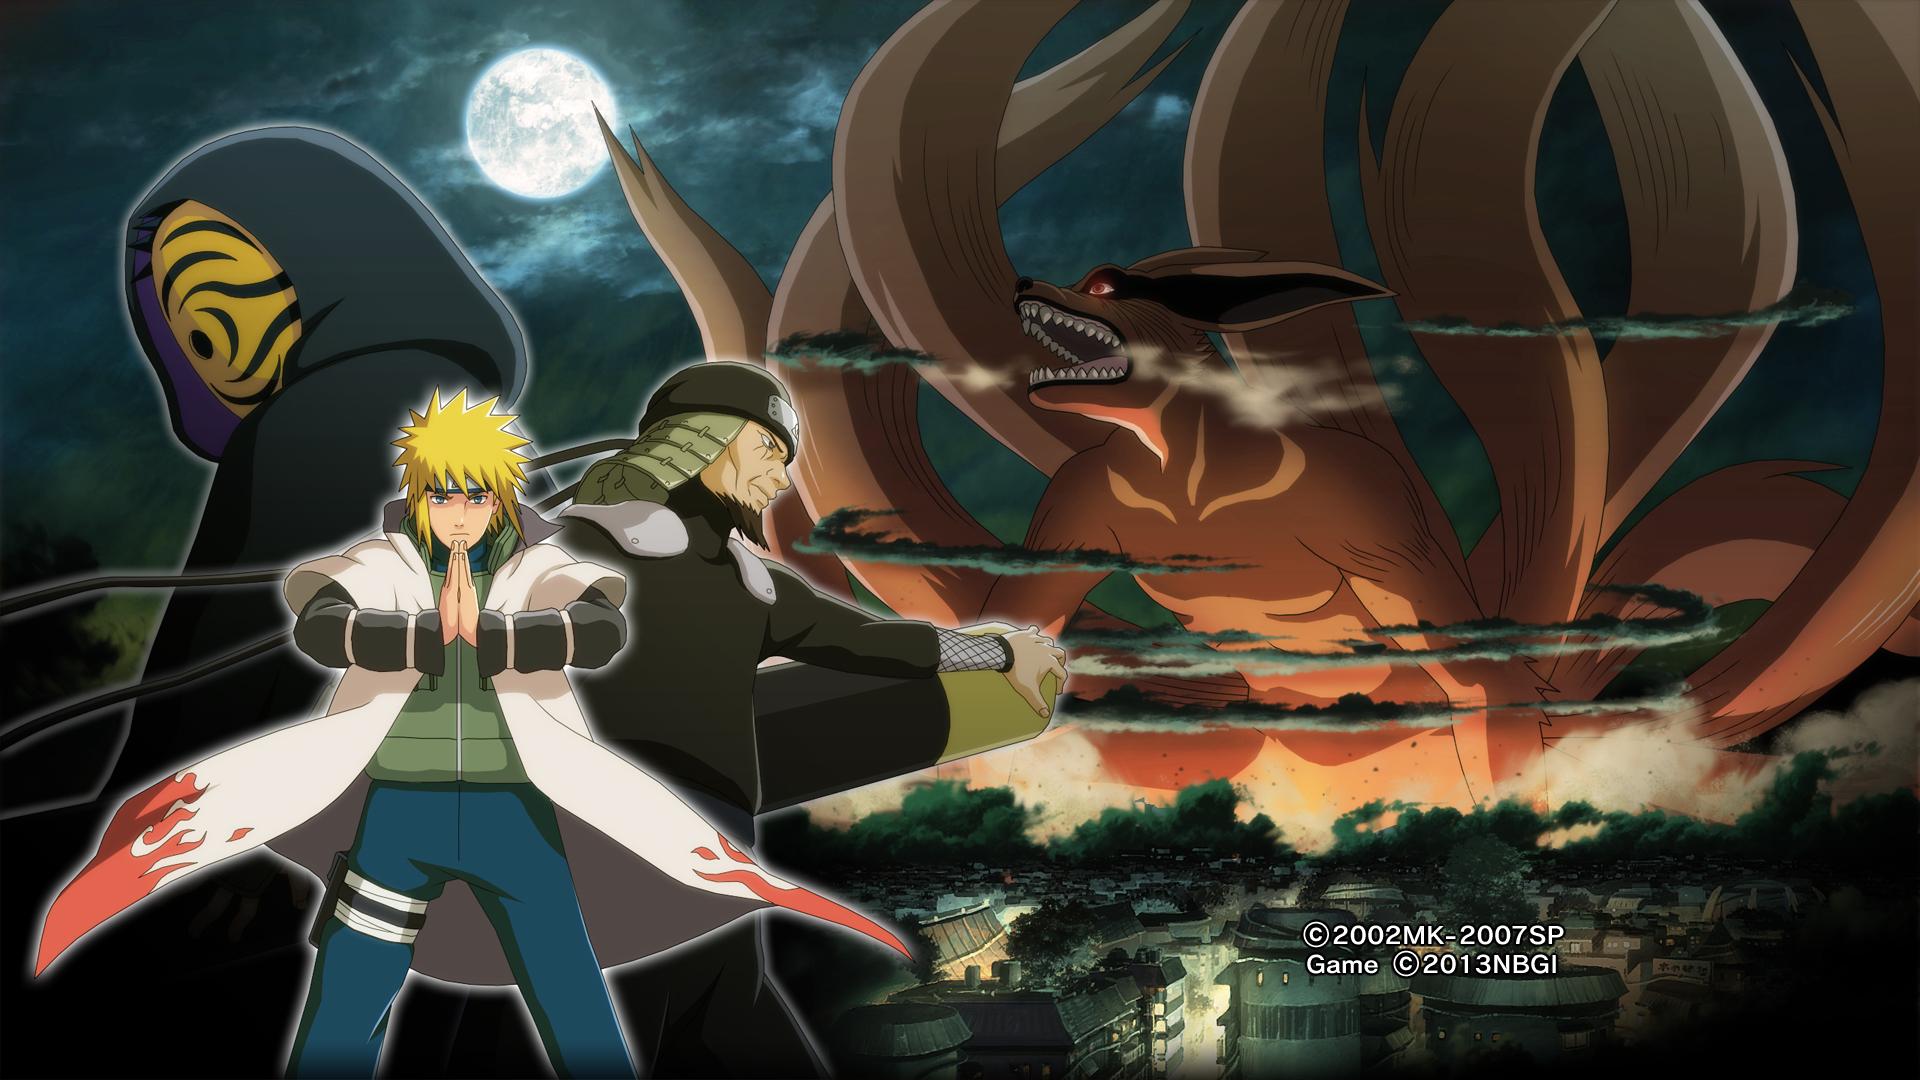 Naruto Shippuden: Ultimate Ninja Storm 3 HD Wallpaper